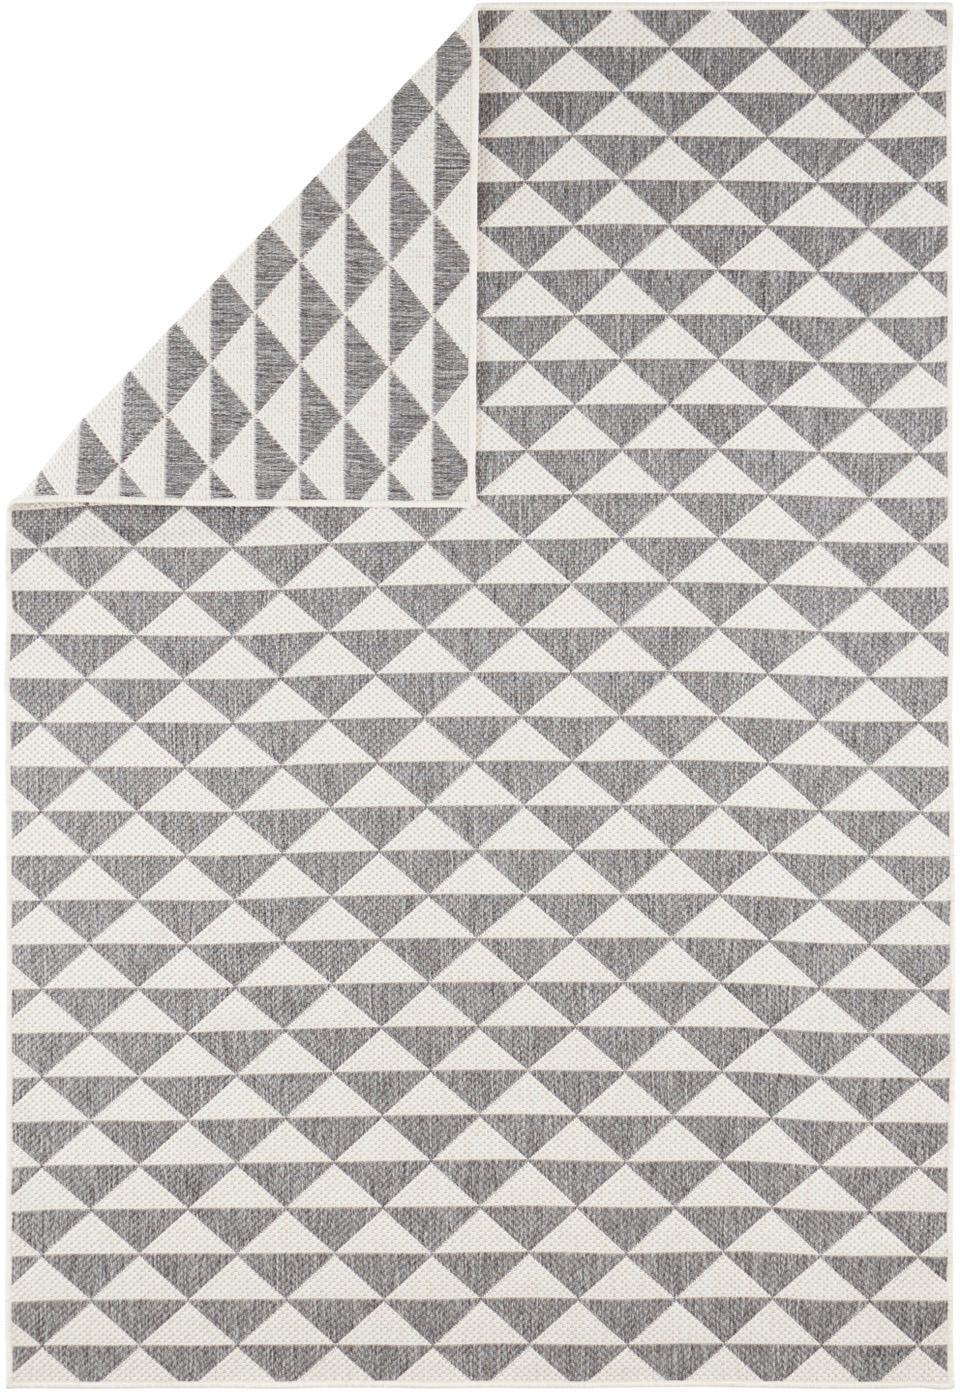 Gemusterter In- & Outdoor-Teppich Tahiti in Grau/Creme, 100% Polypropylen, Grau, Cremefarben, B 200 x L 290 cm (Größe L)